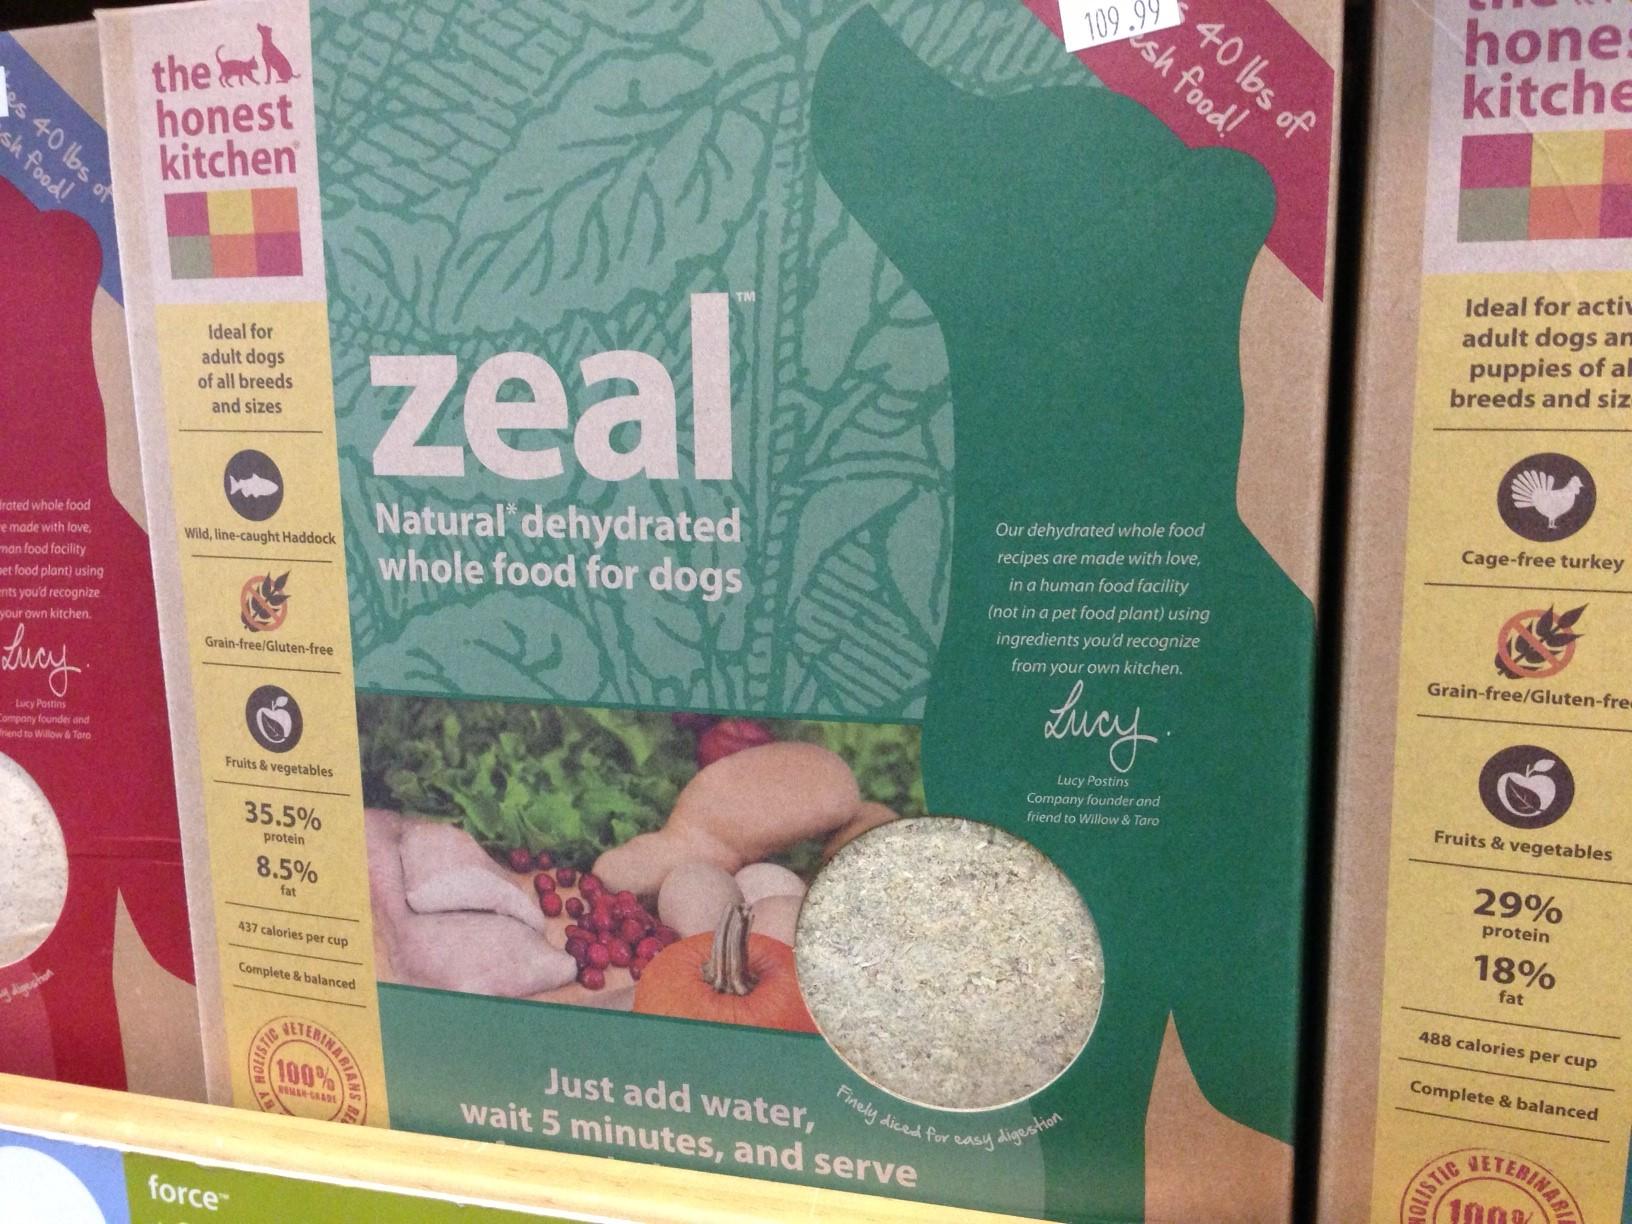 honest-kitchen-wag-natural-pet-market-tampa